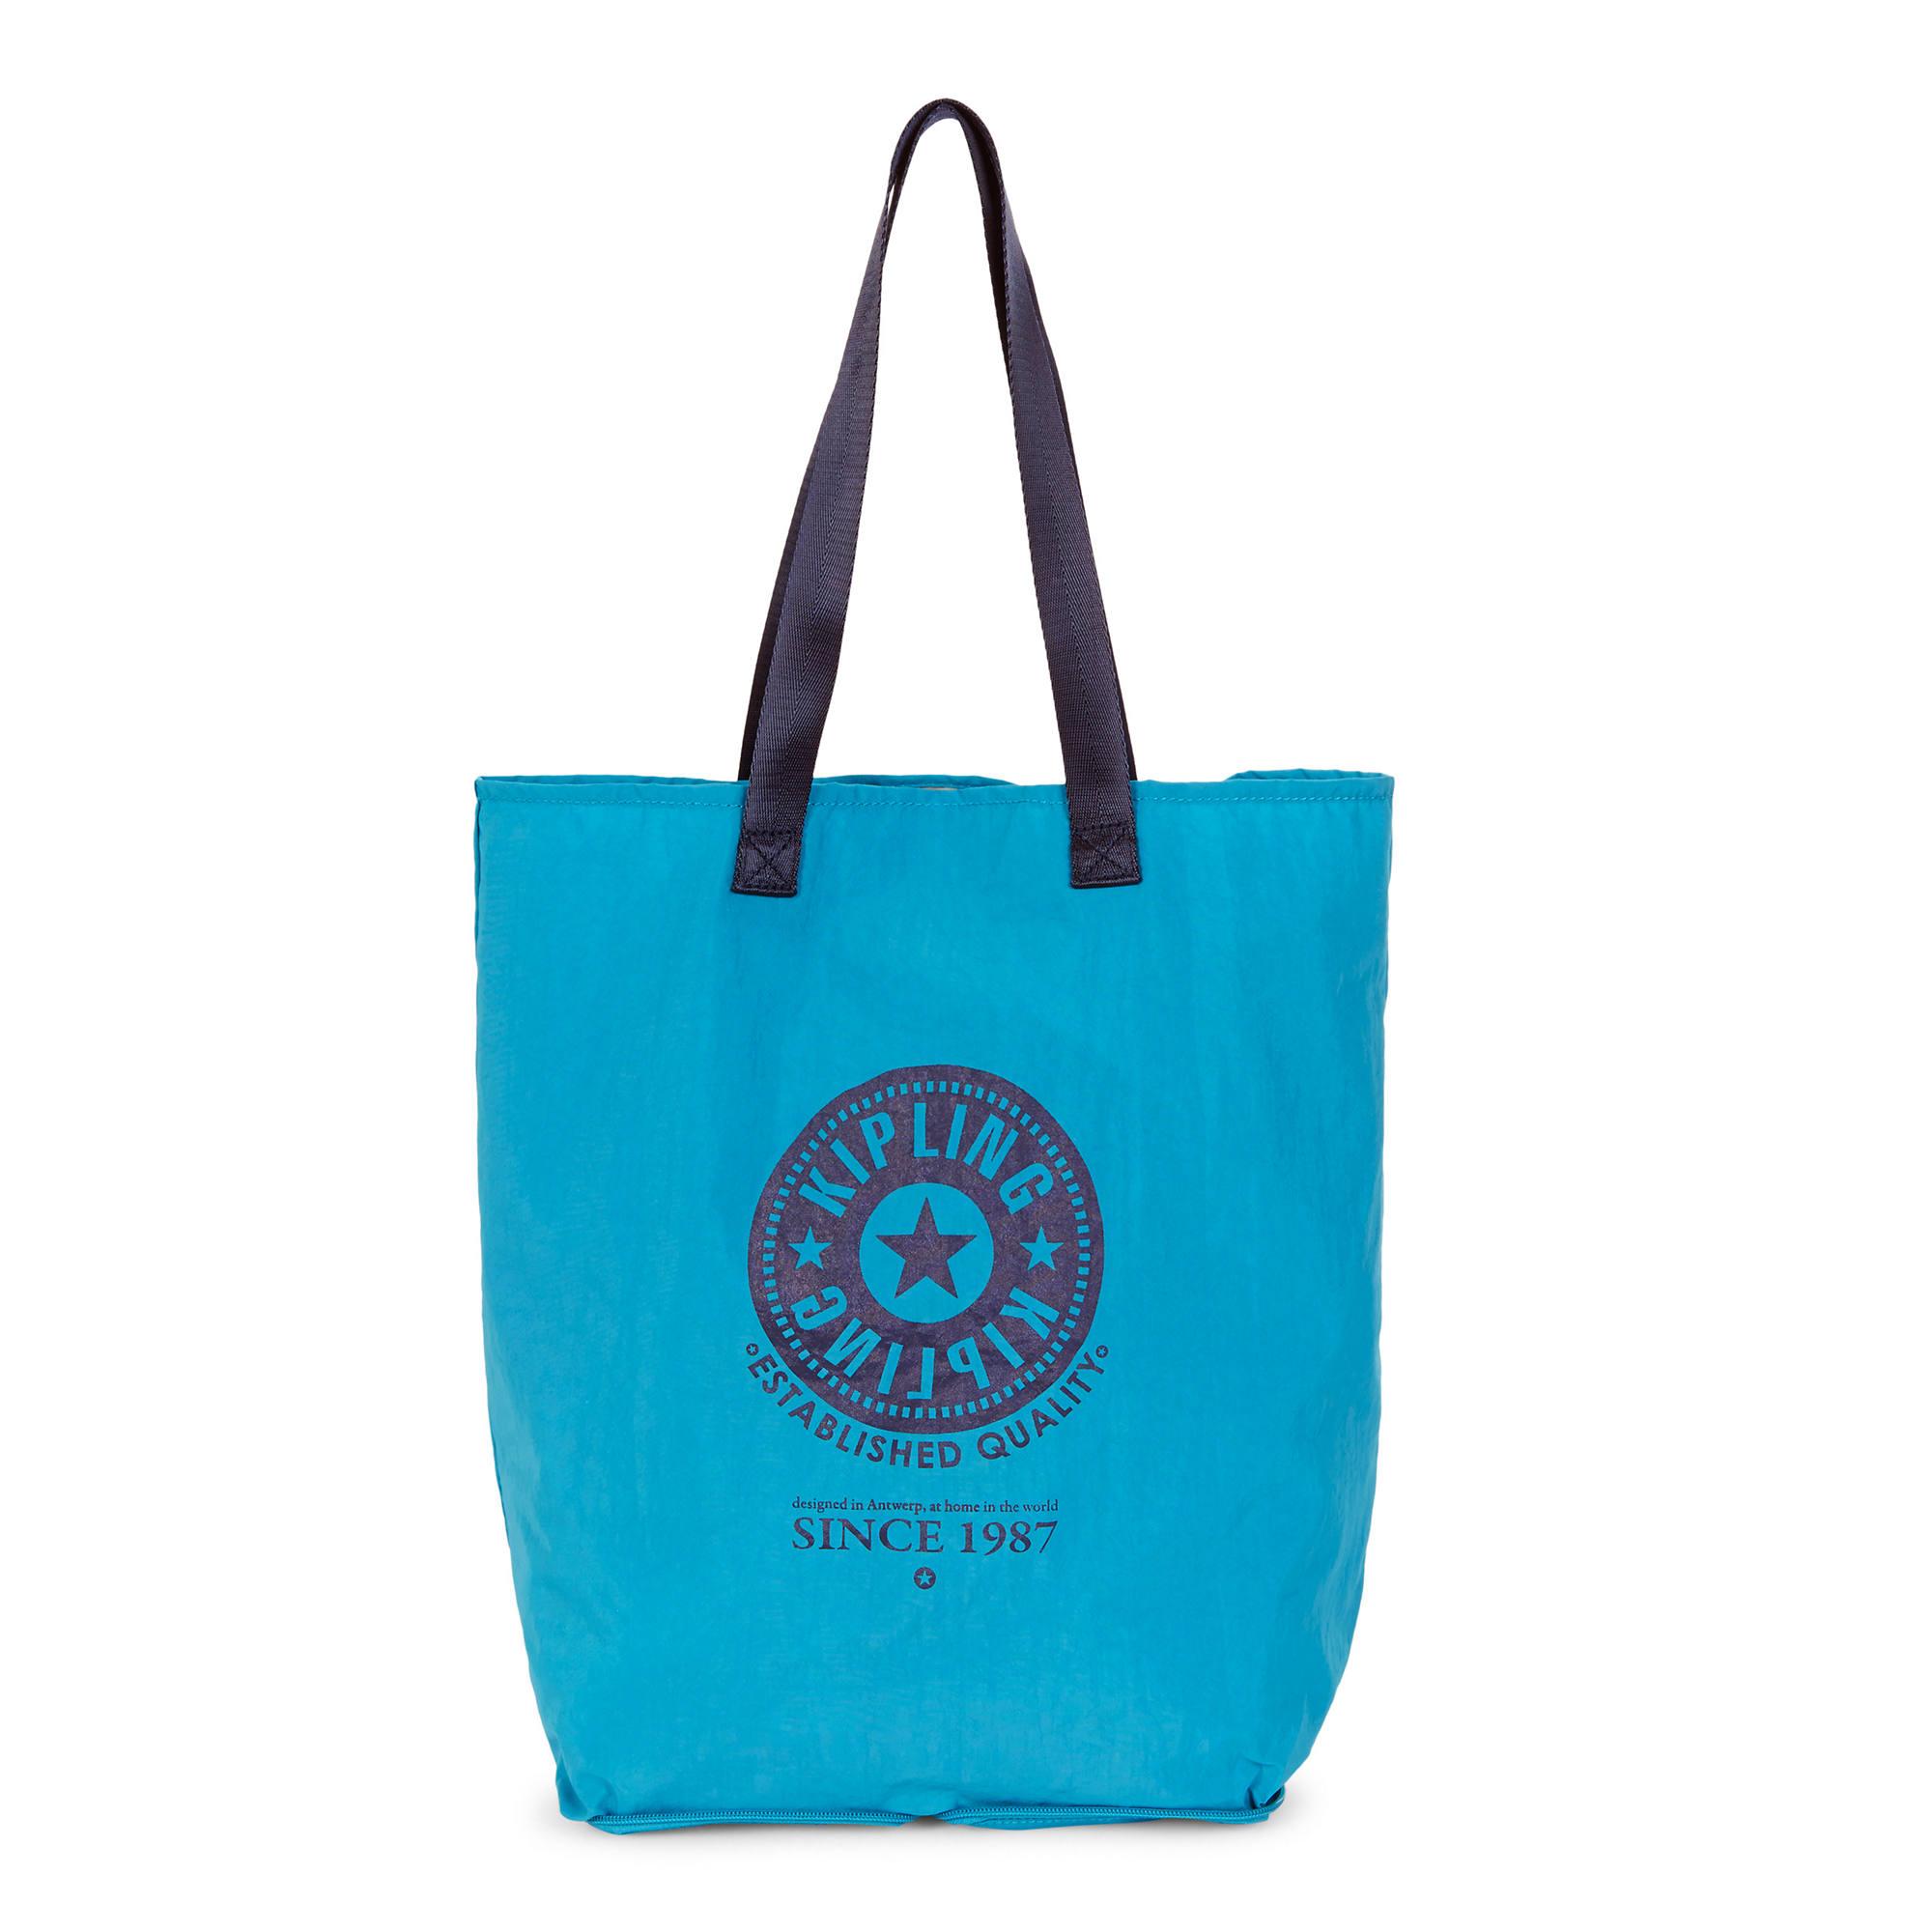 25aac46077 Hip Hurray Foldable Tote Bag,Polaris Blue,large